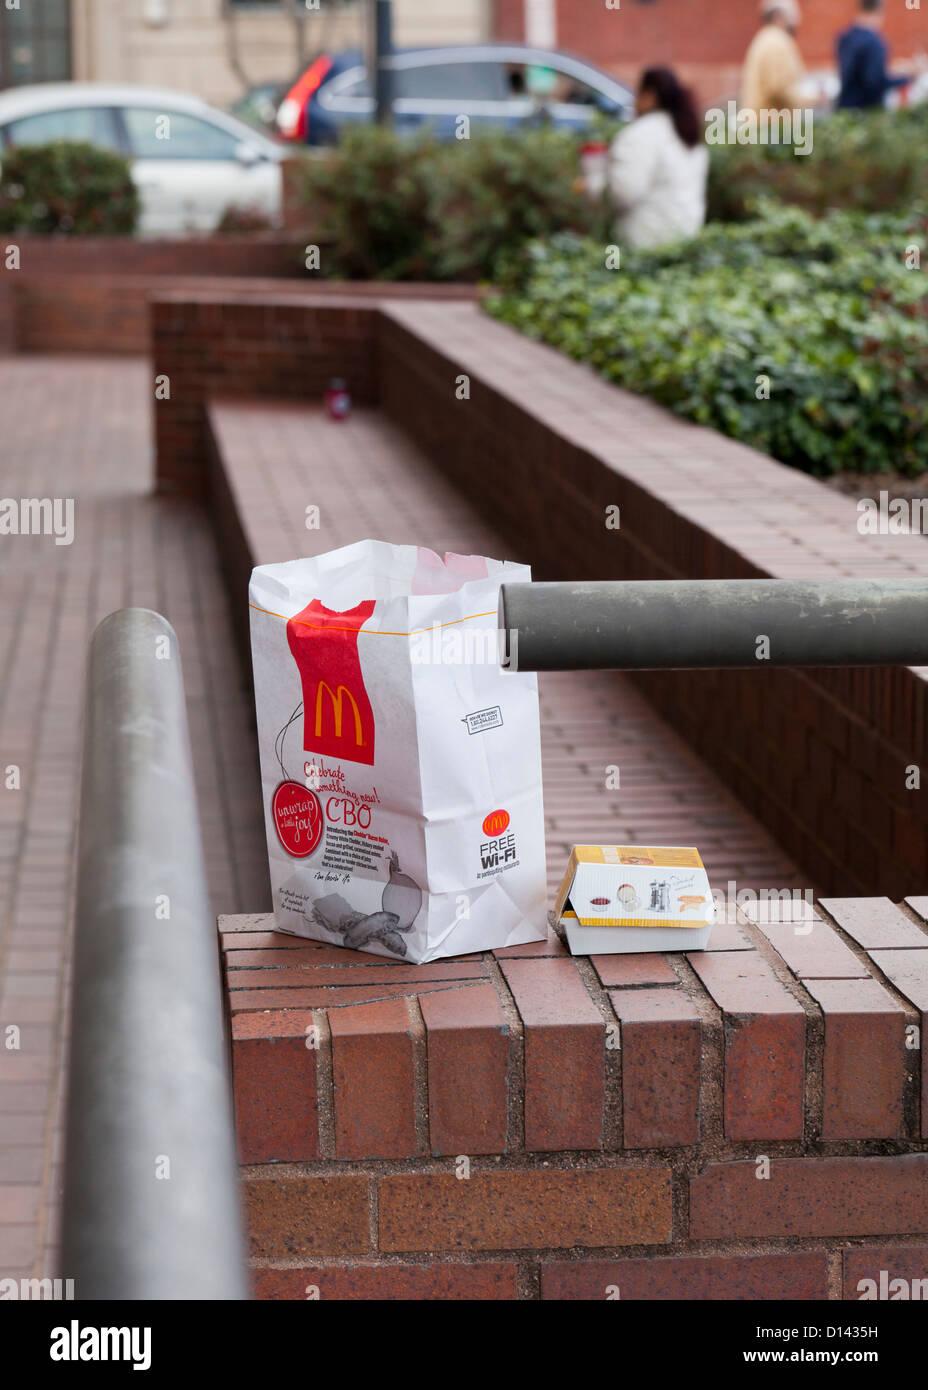 Mcdonald's sac pour emporter au rebut Photo Stock